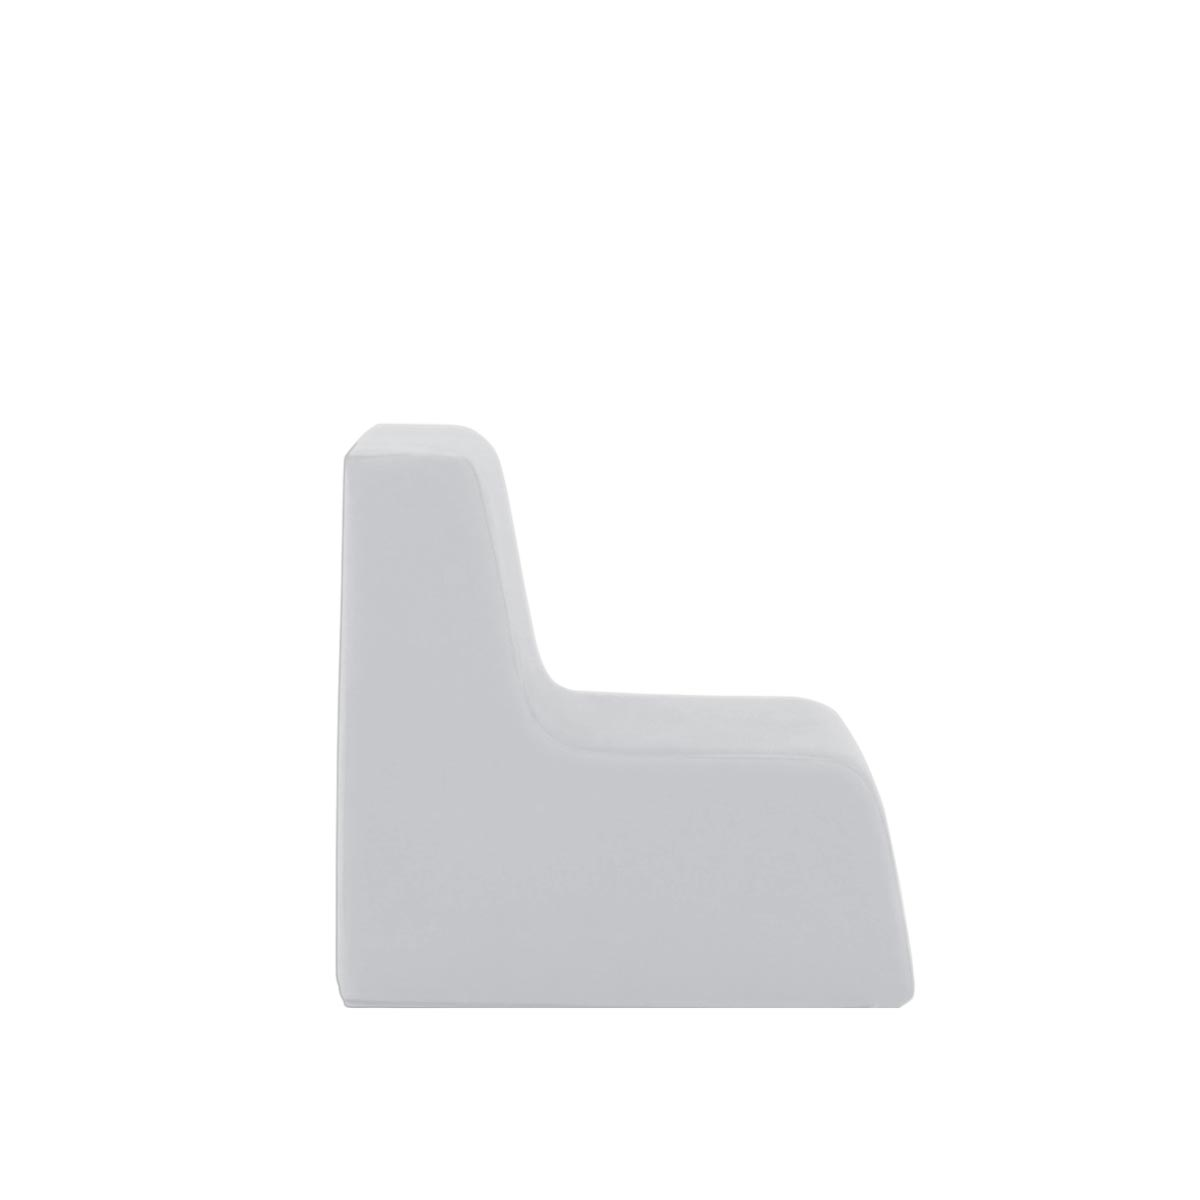 Poltroninha Muss r02 Tecido Lonita Branco 03